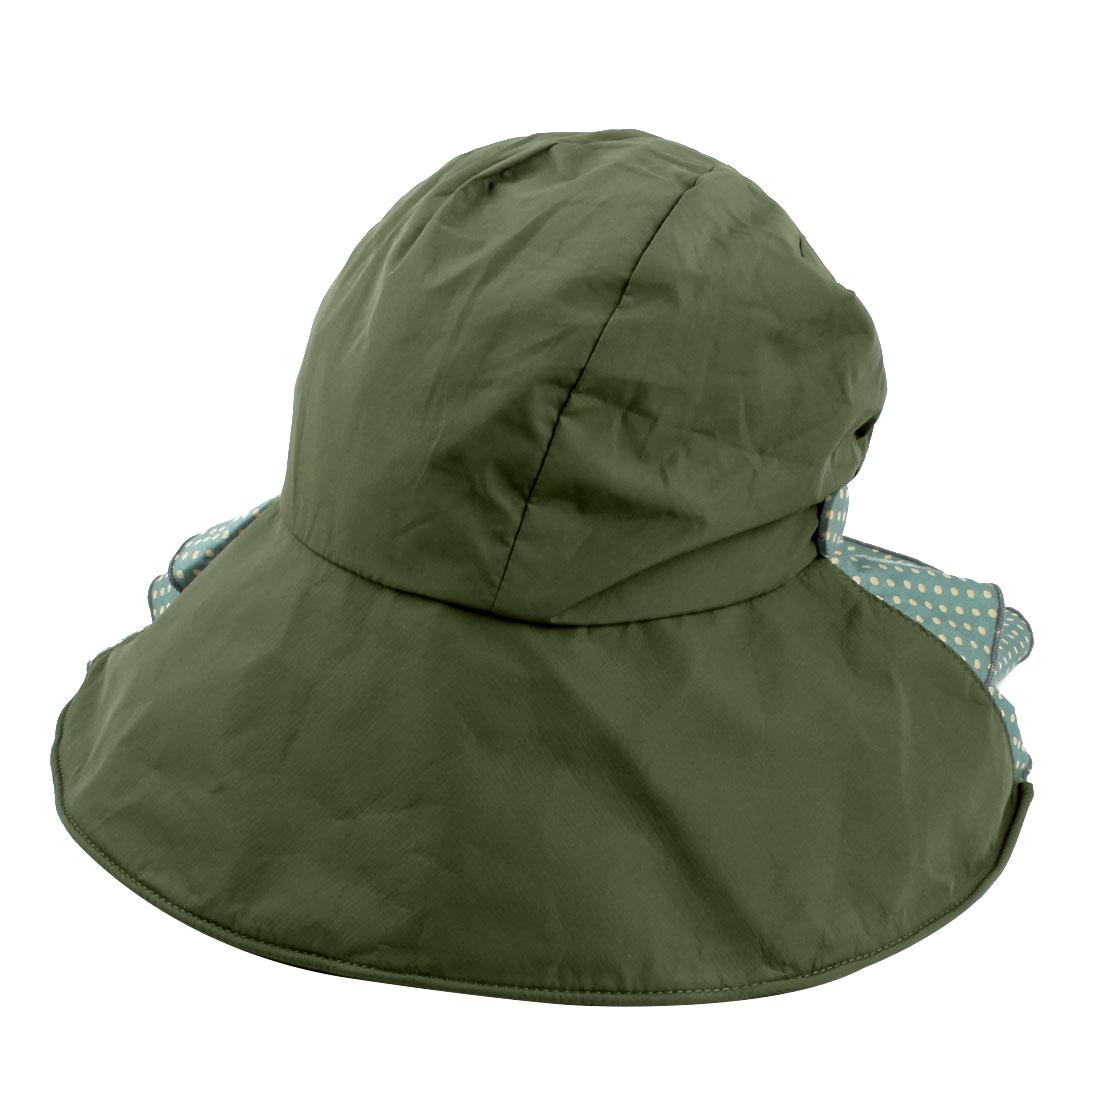 Woman Outdoor Travel Cotton Blends Dots Pattern Floppy Beach Cap Sun Visor Hat Army Green